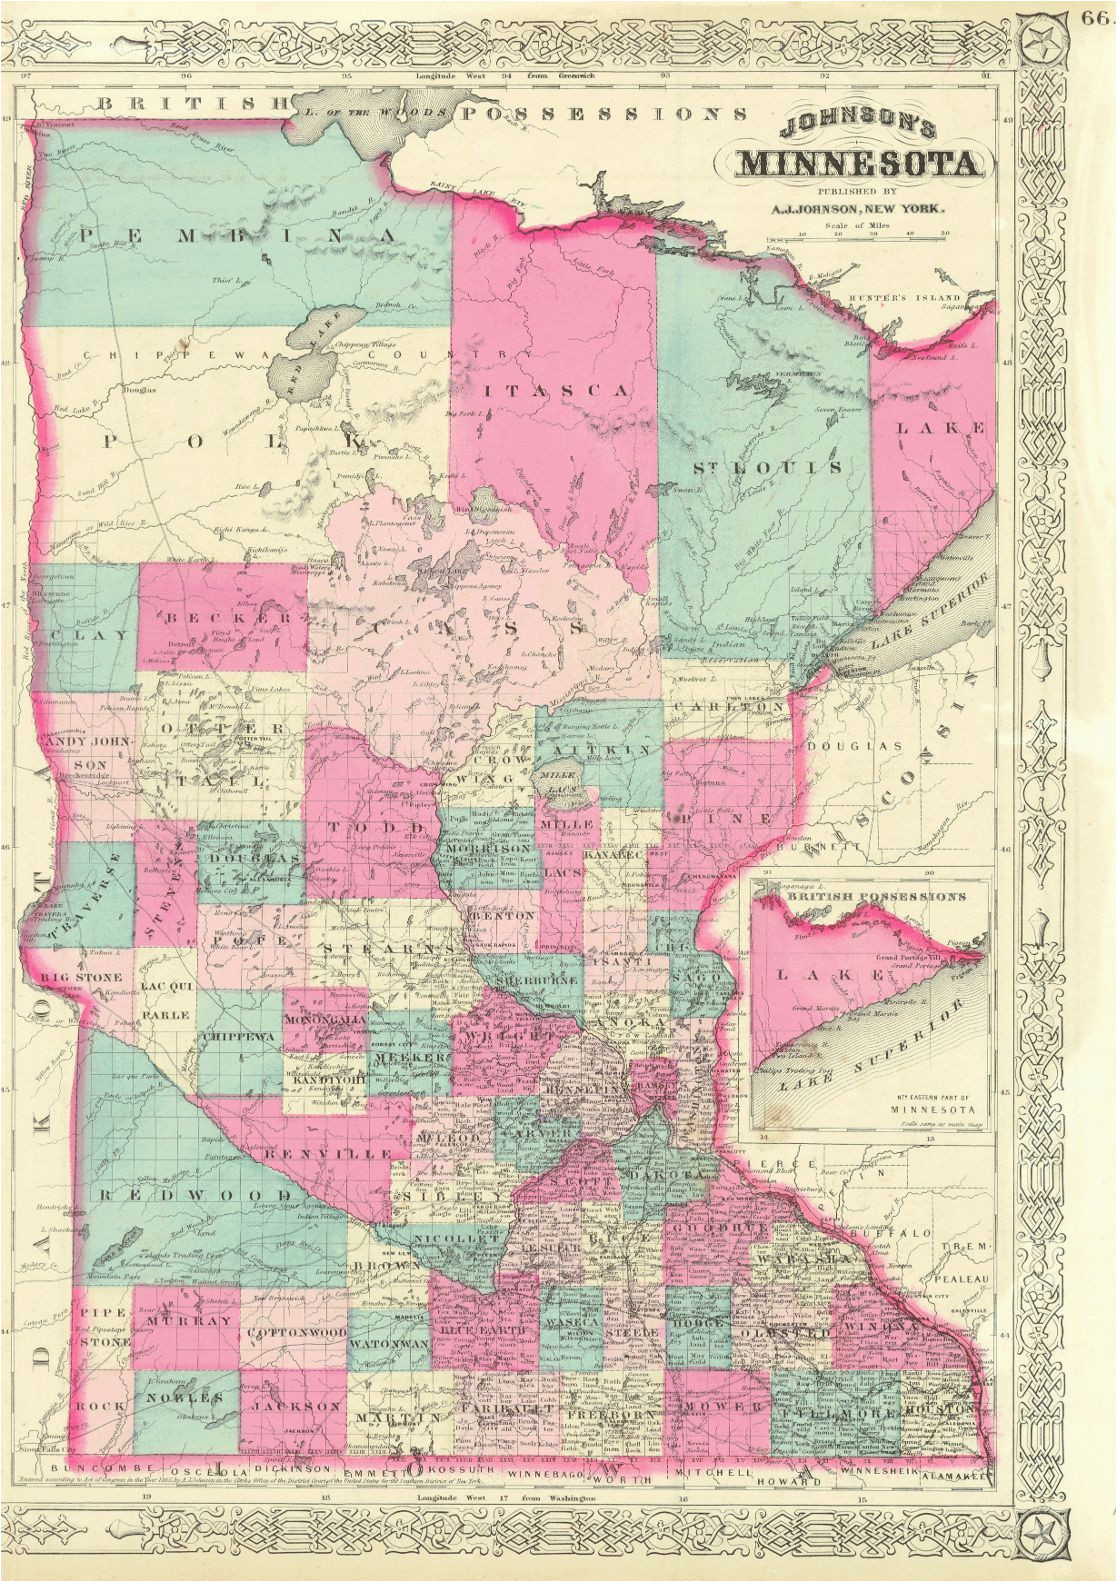 1852 mitchell minnesota territory map before north or south dakota